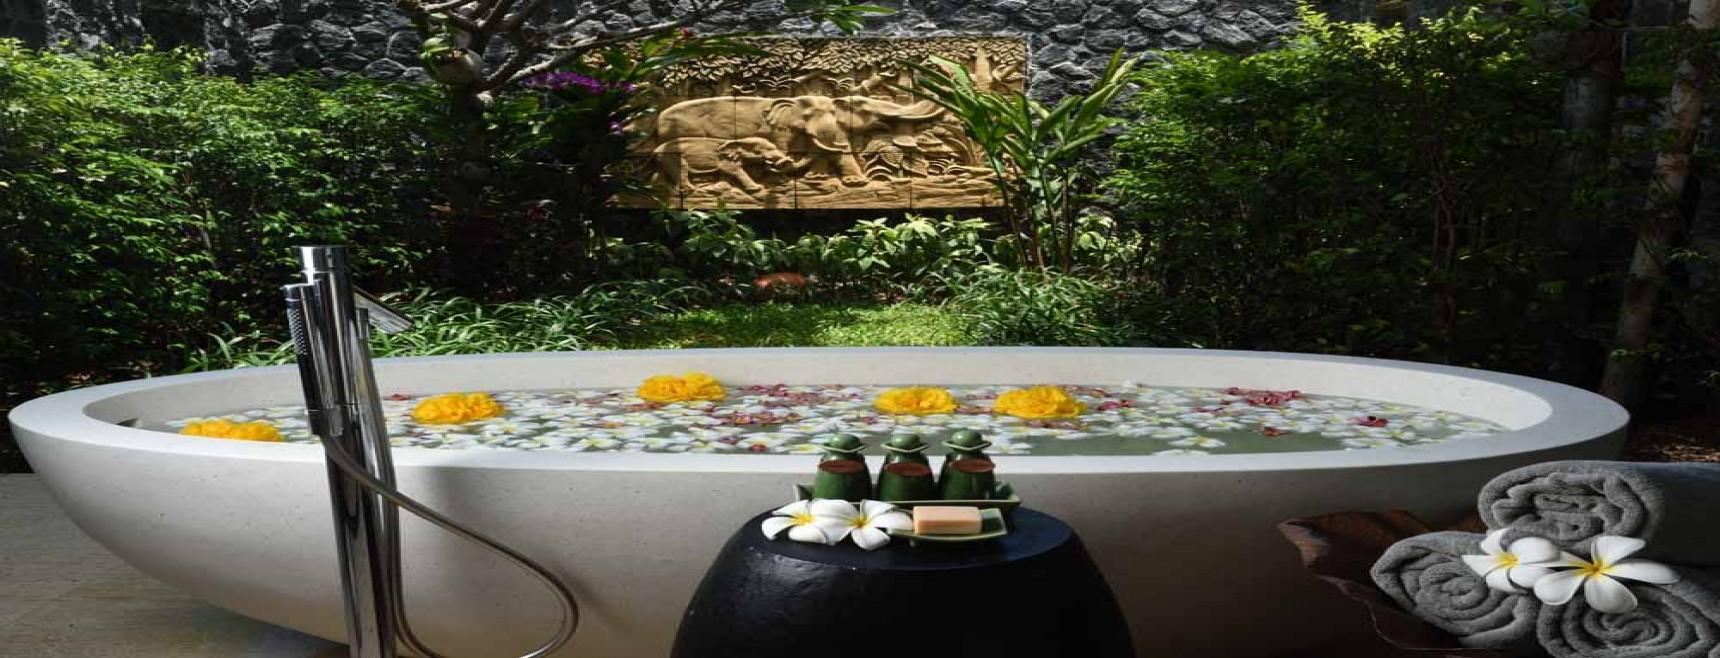 6 Bedrooms, Villa, Holiday Villa Rentals, Listing ID 1139, Bophut, North East, Koh Samui,